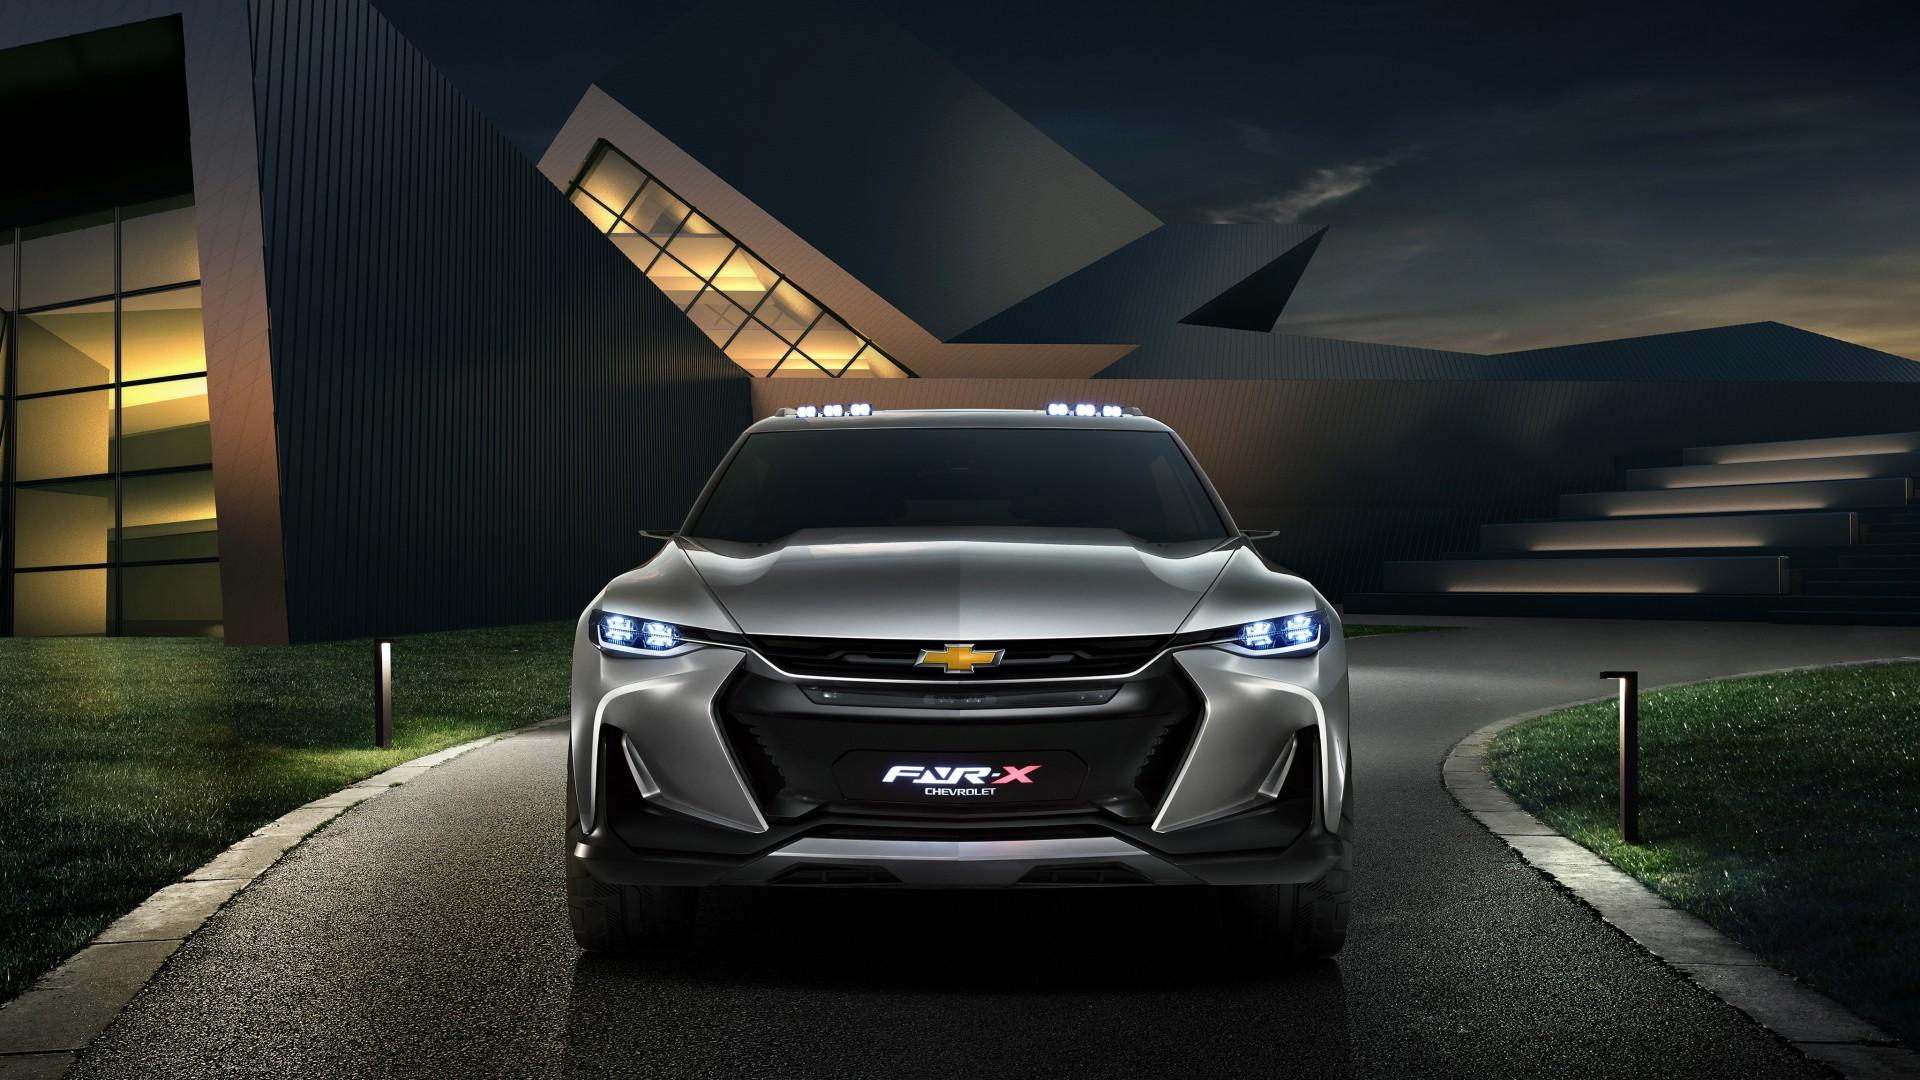 2017 Chevrolet FNR X Concept Wallpaper | HD Car Wallpapers ...